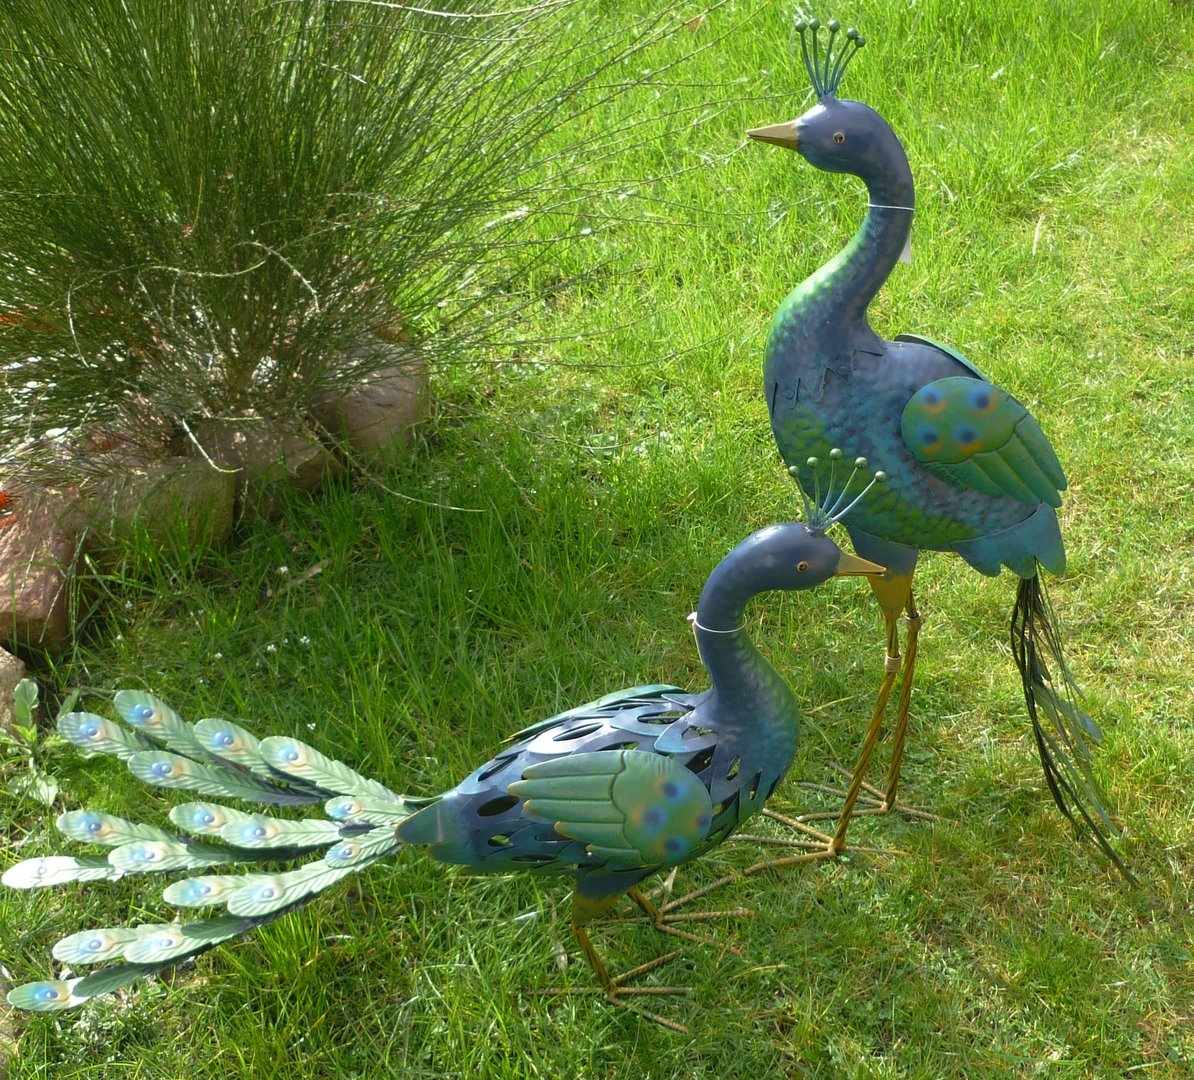 Gartenfigur 2er set pfau metall figur bunt deko vogel for Deko vogel garten